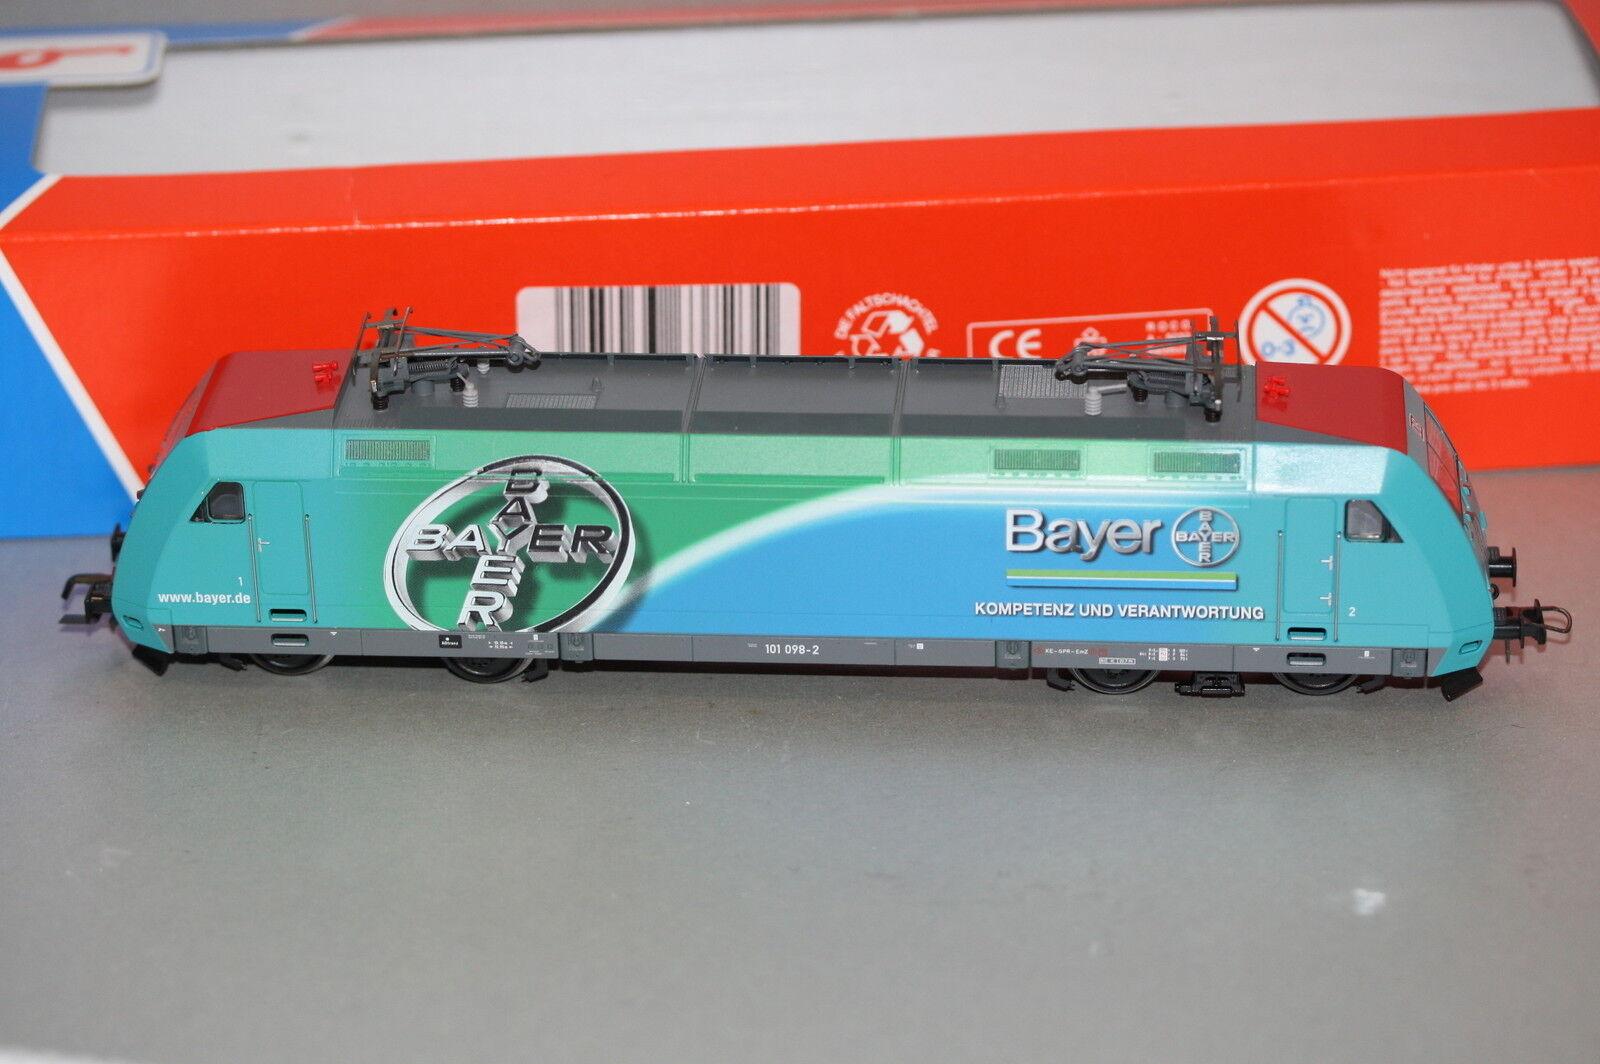 Roco 63723 elok serie 101 098-2 DB bayer DSS Spur h0 OVP